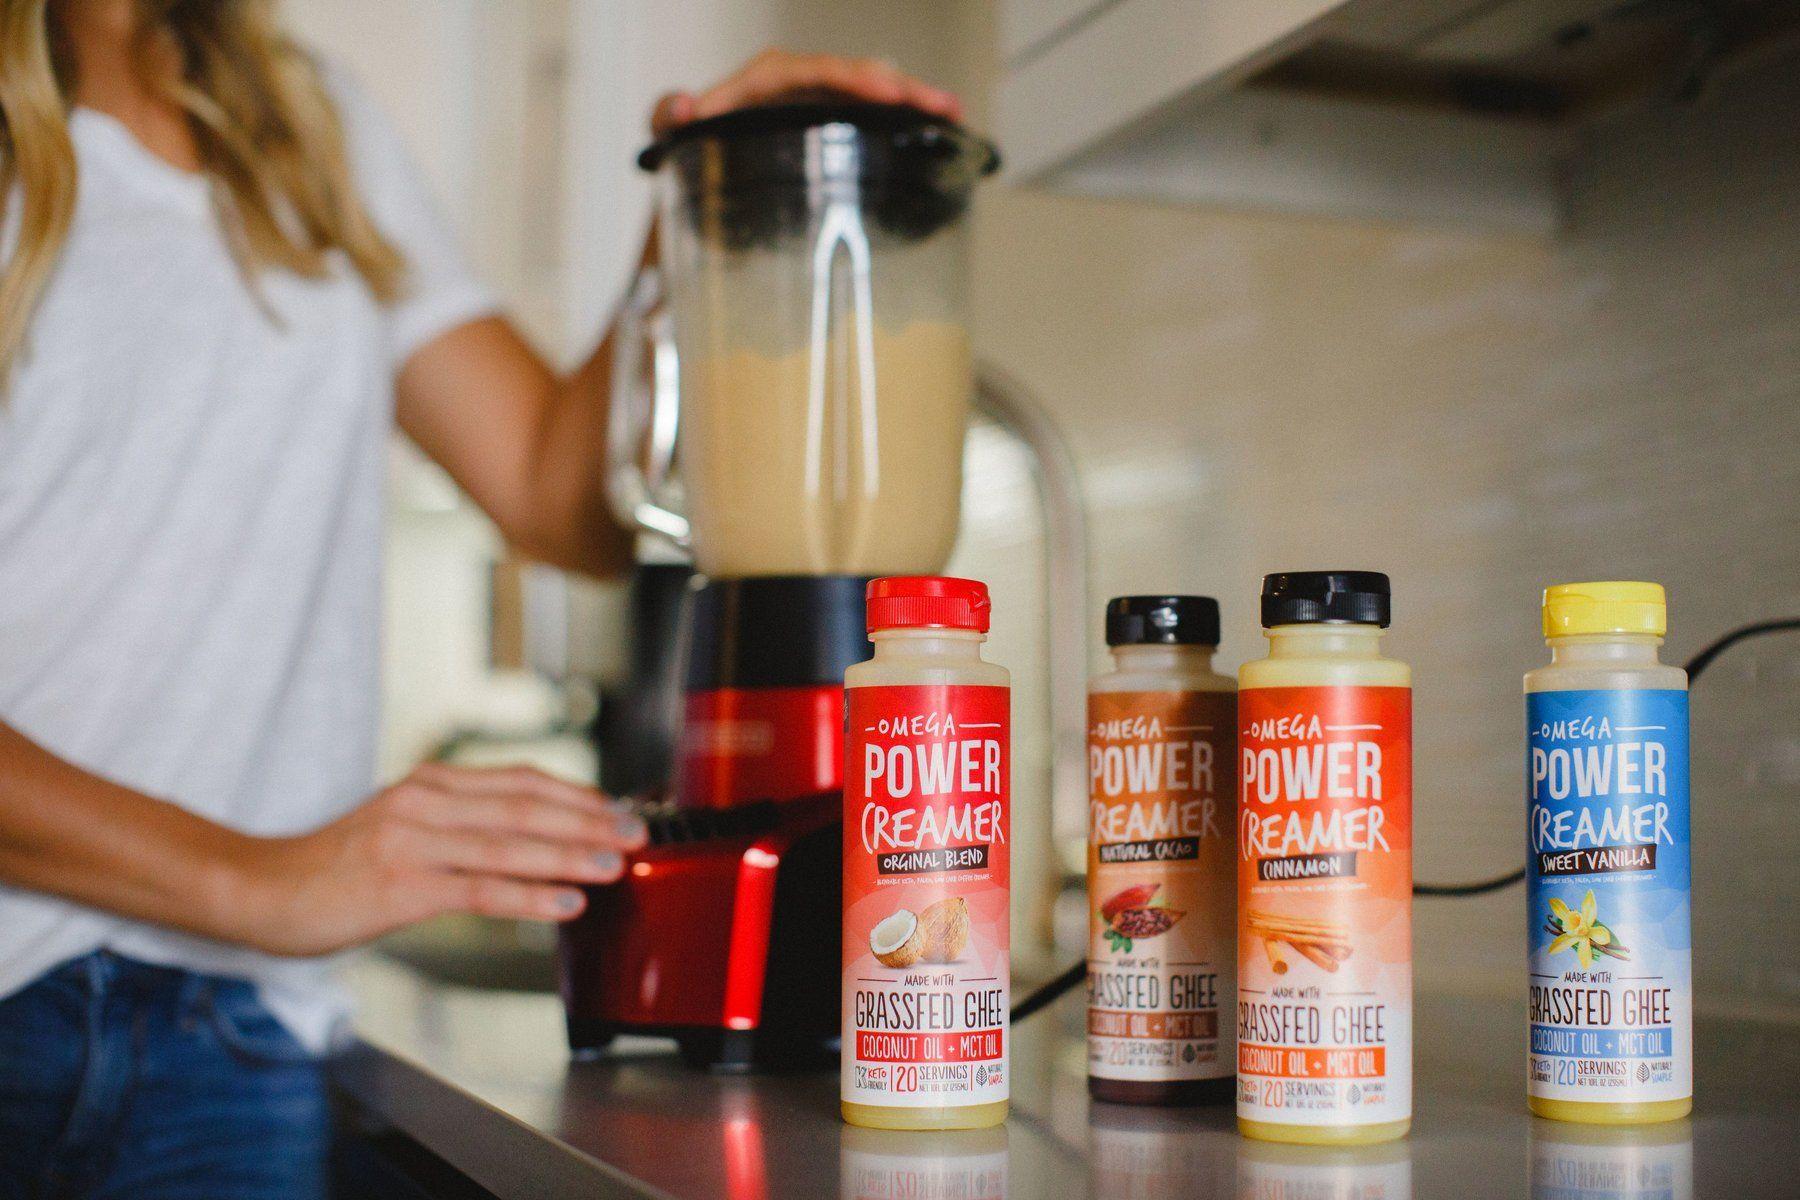 Omega powercreamer powercreamer keto coffee made easy